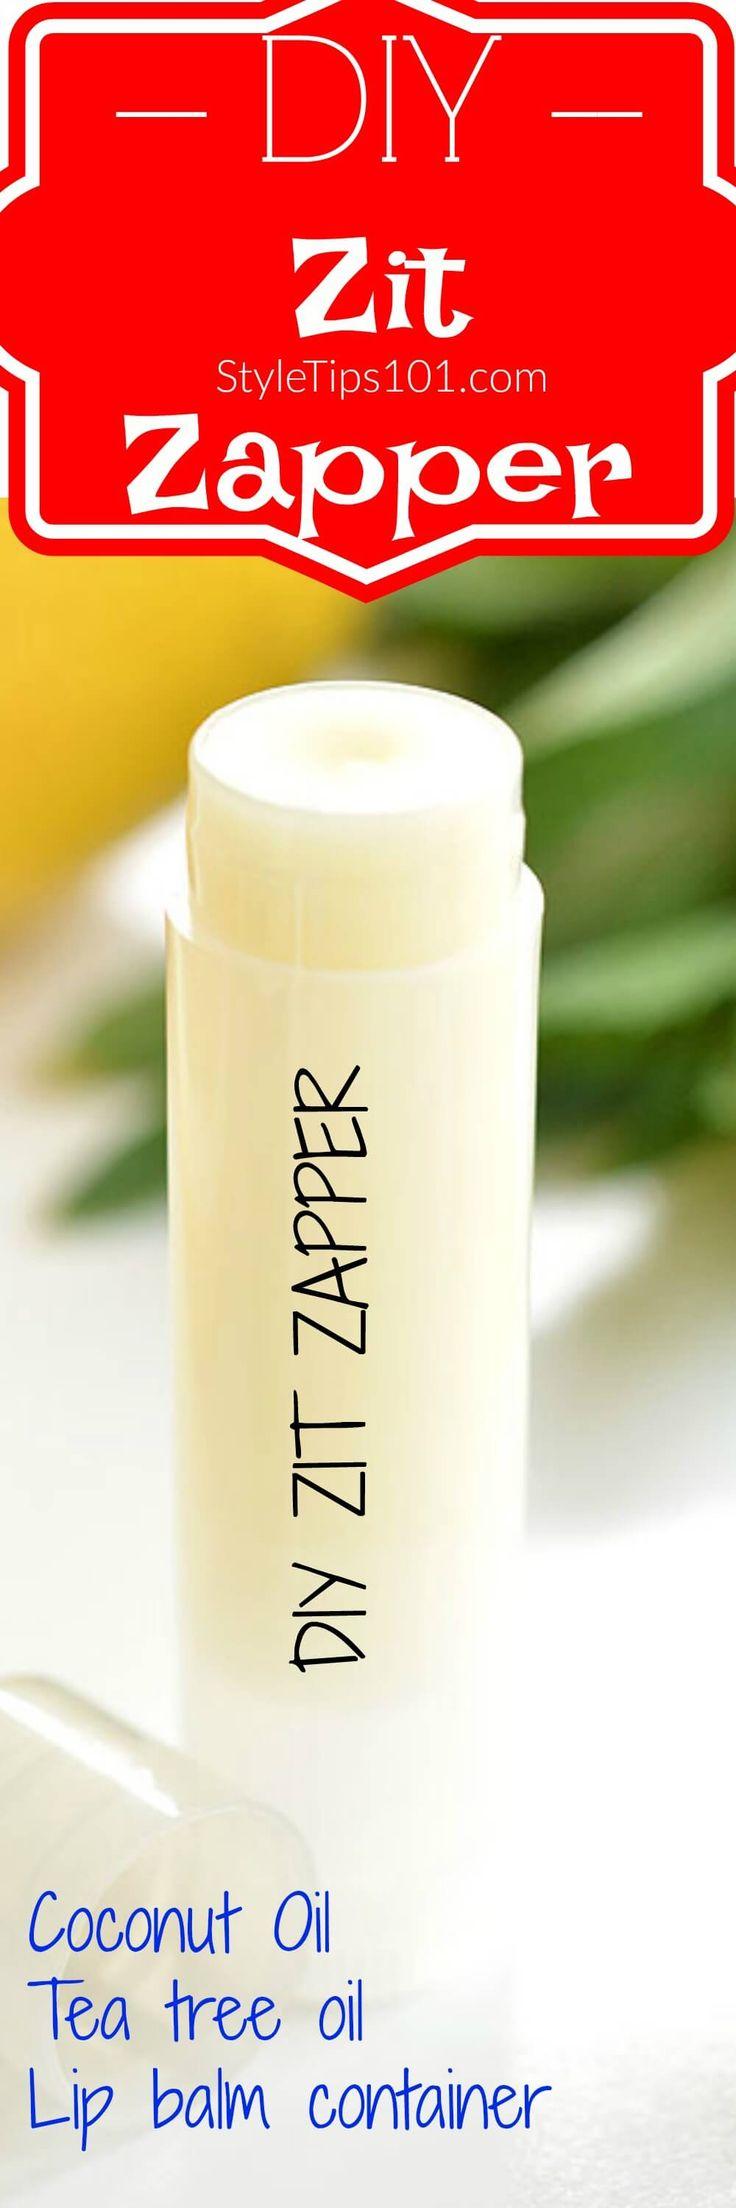 1/8 cup coconut oil  5-7 drops tea tree oil  lip balm tube via @styletips1o1